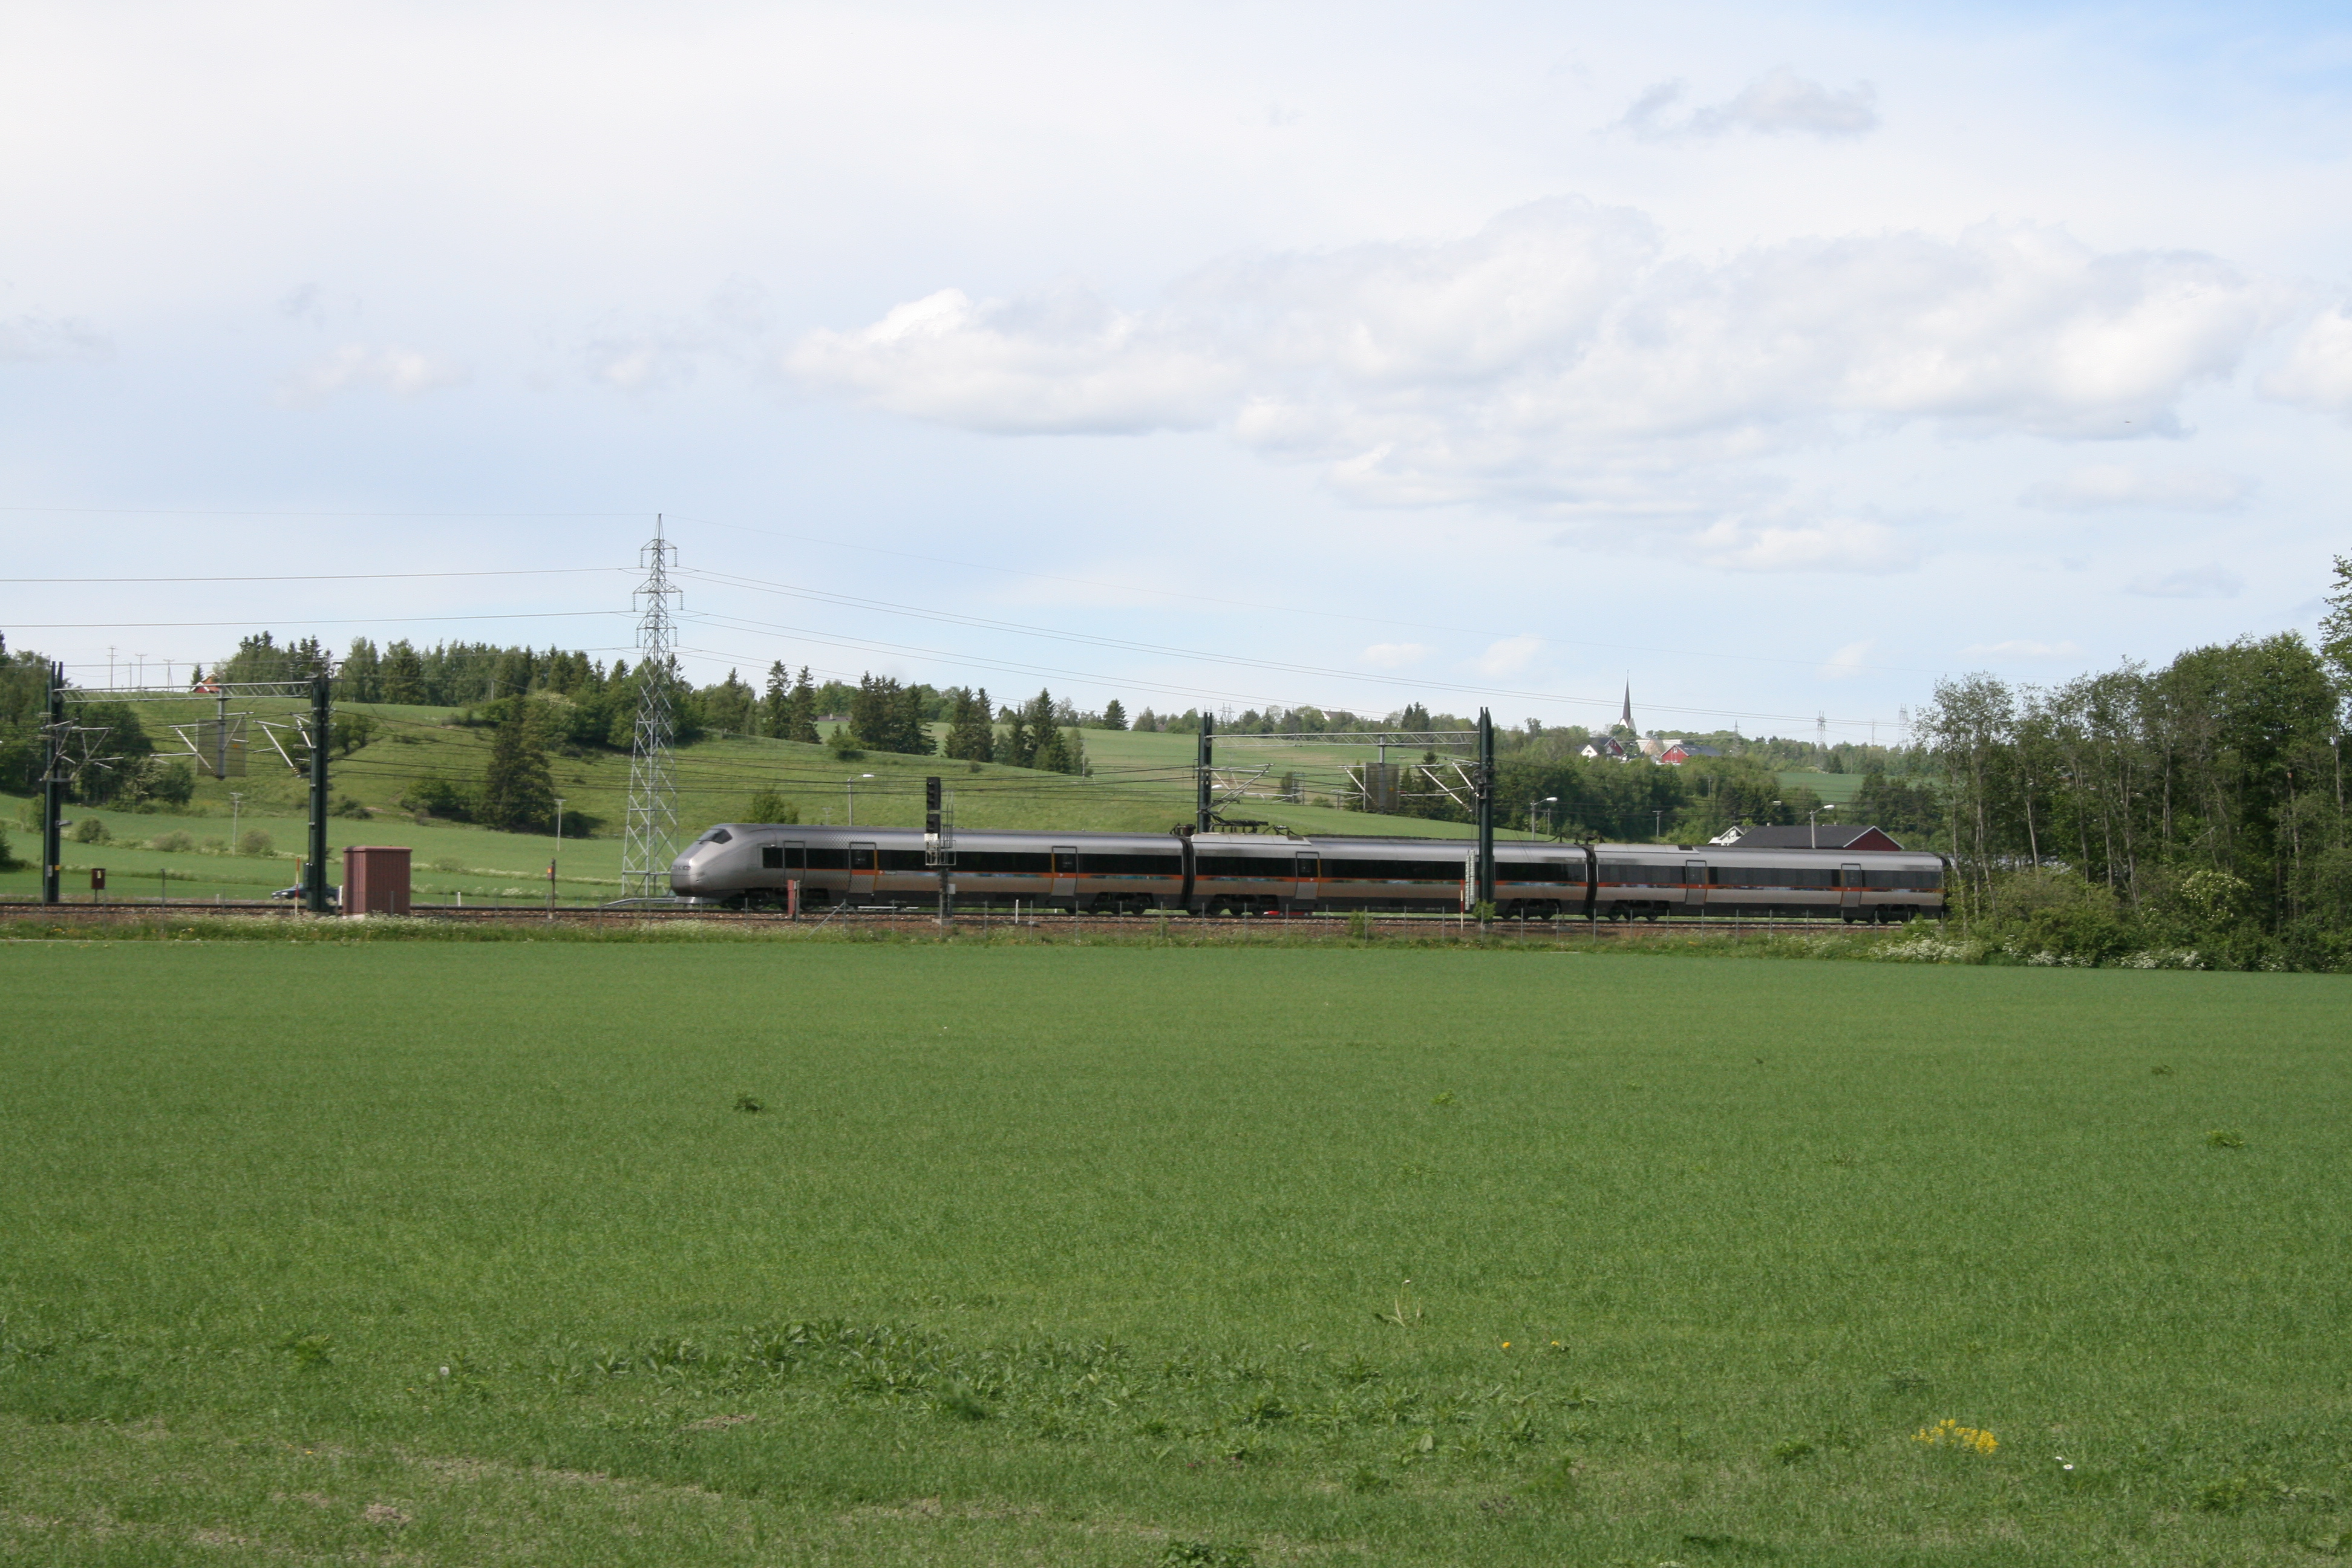 Gardermoen nagysebességű vasútvonal